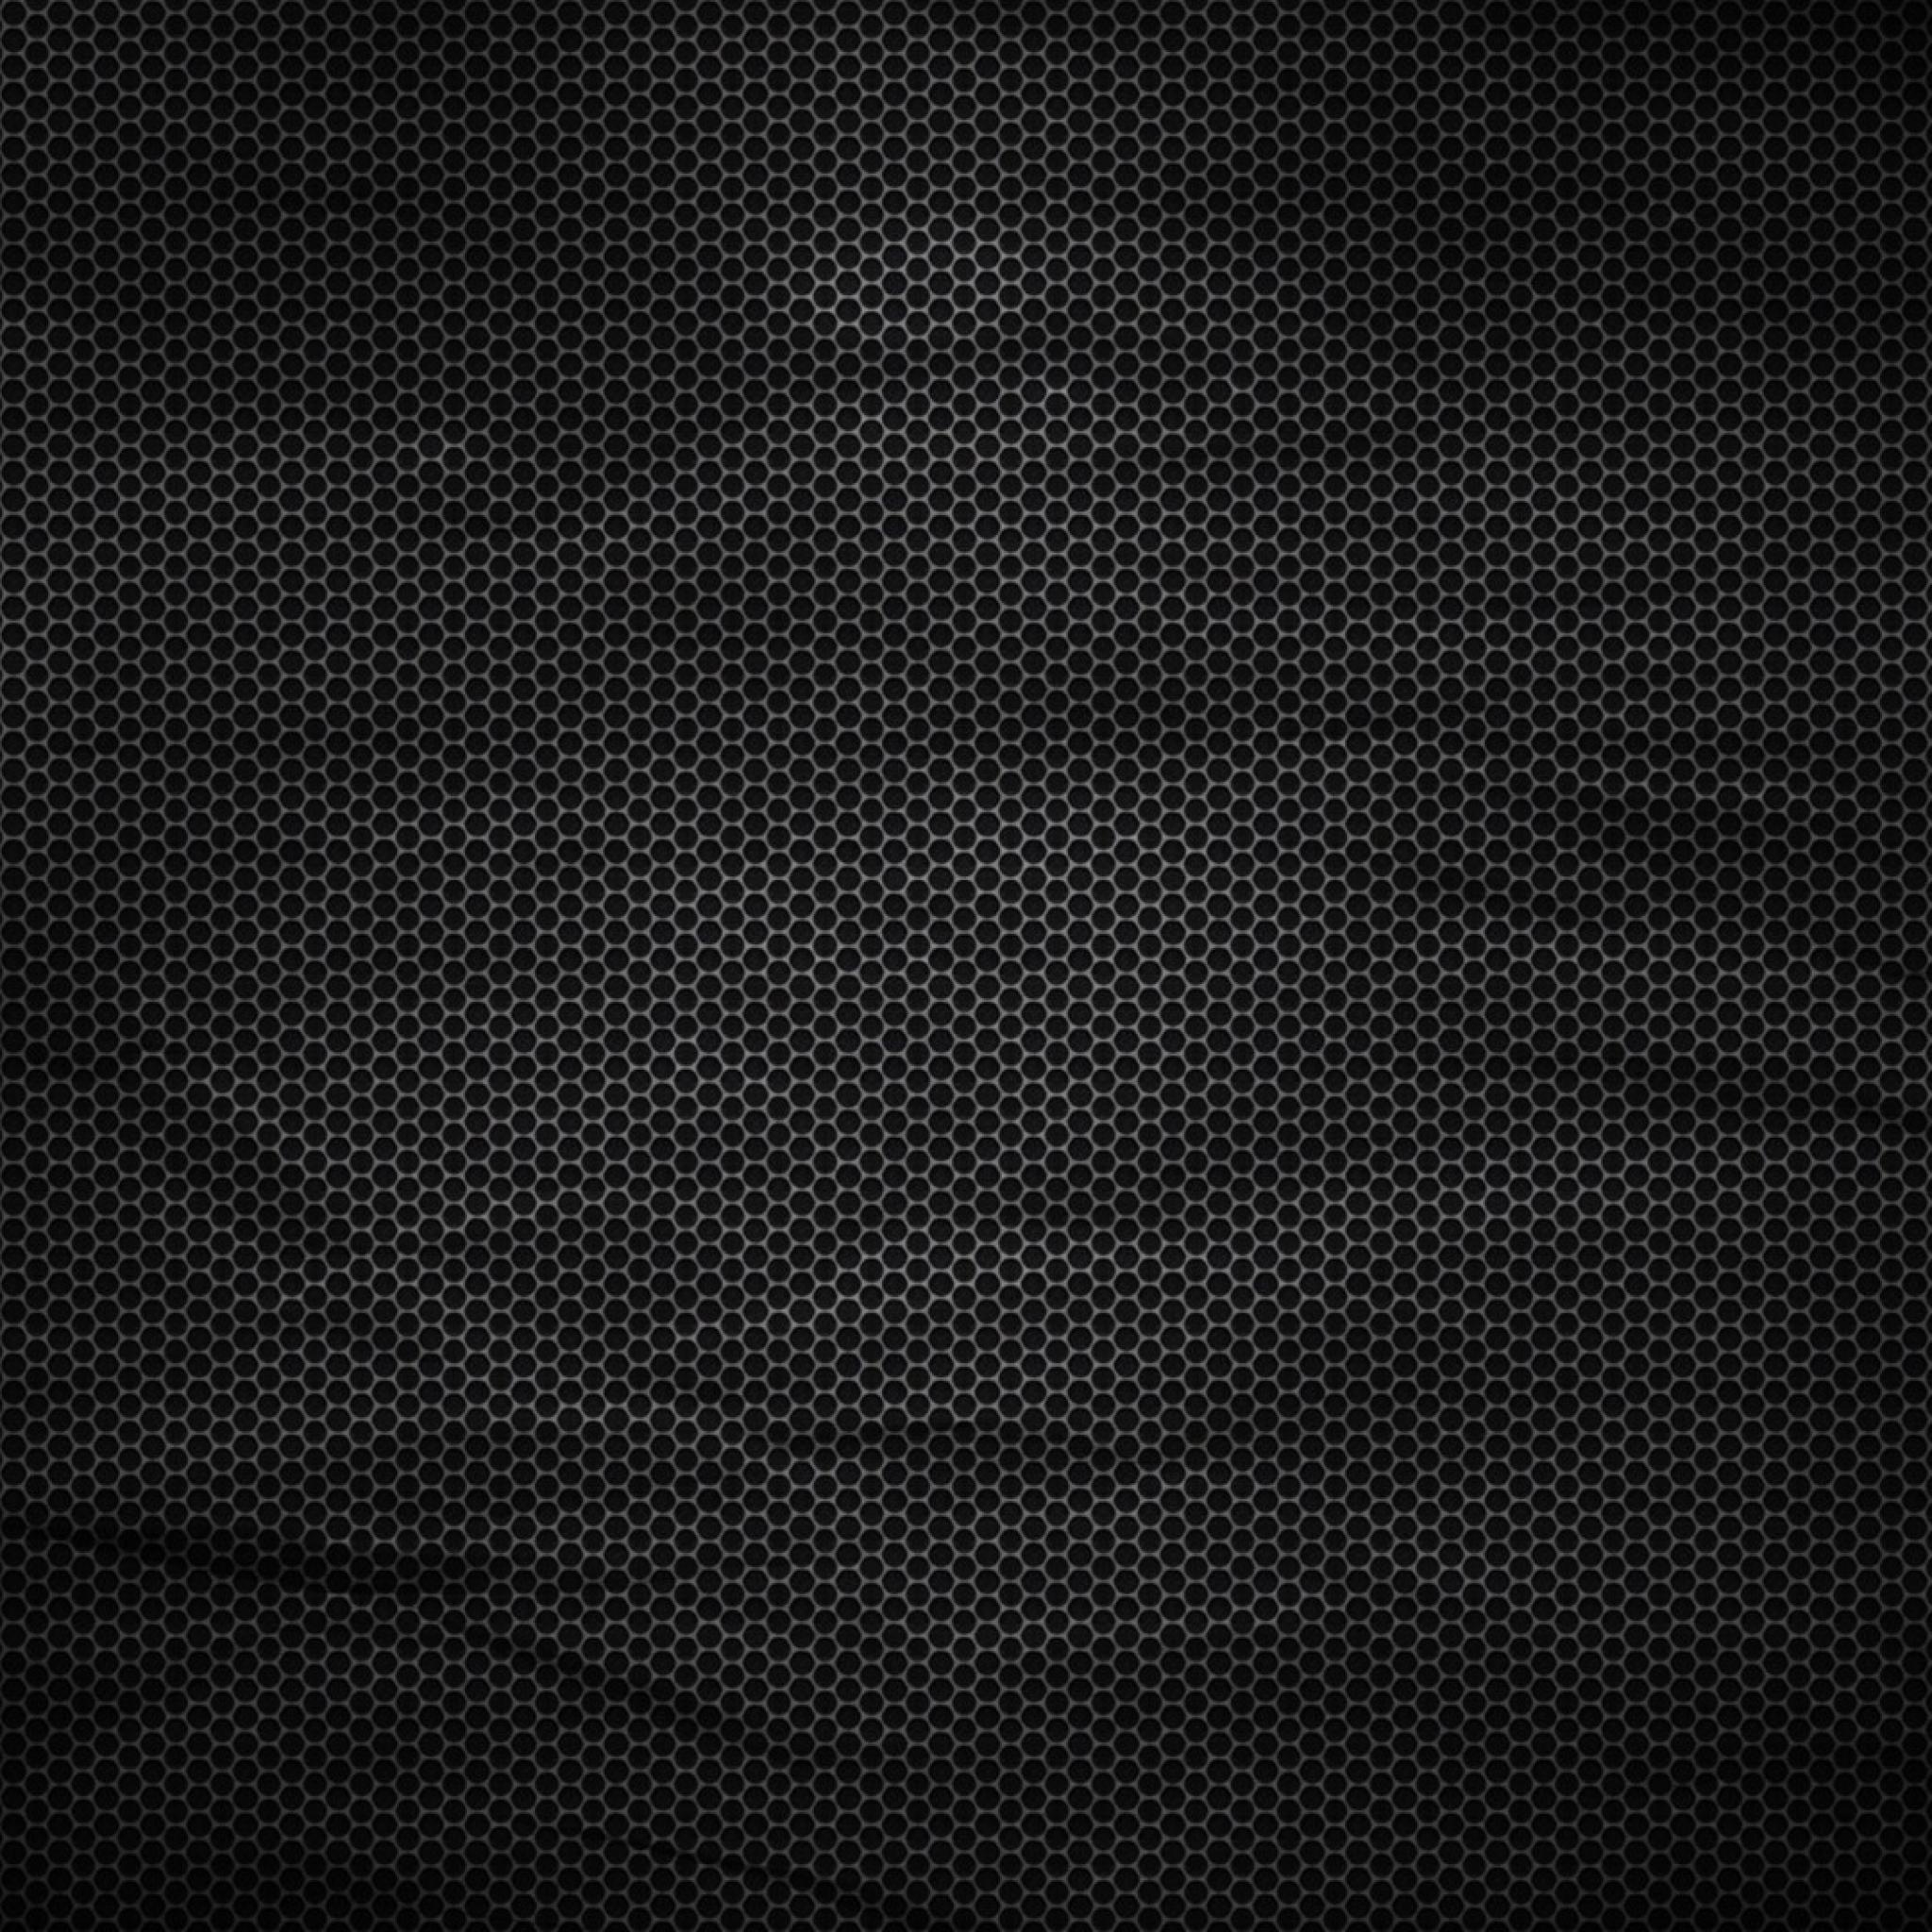 Ipad Air Wallpaper Size